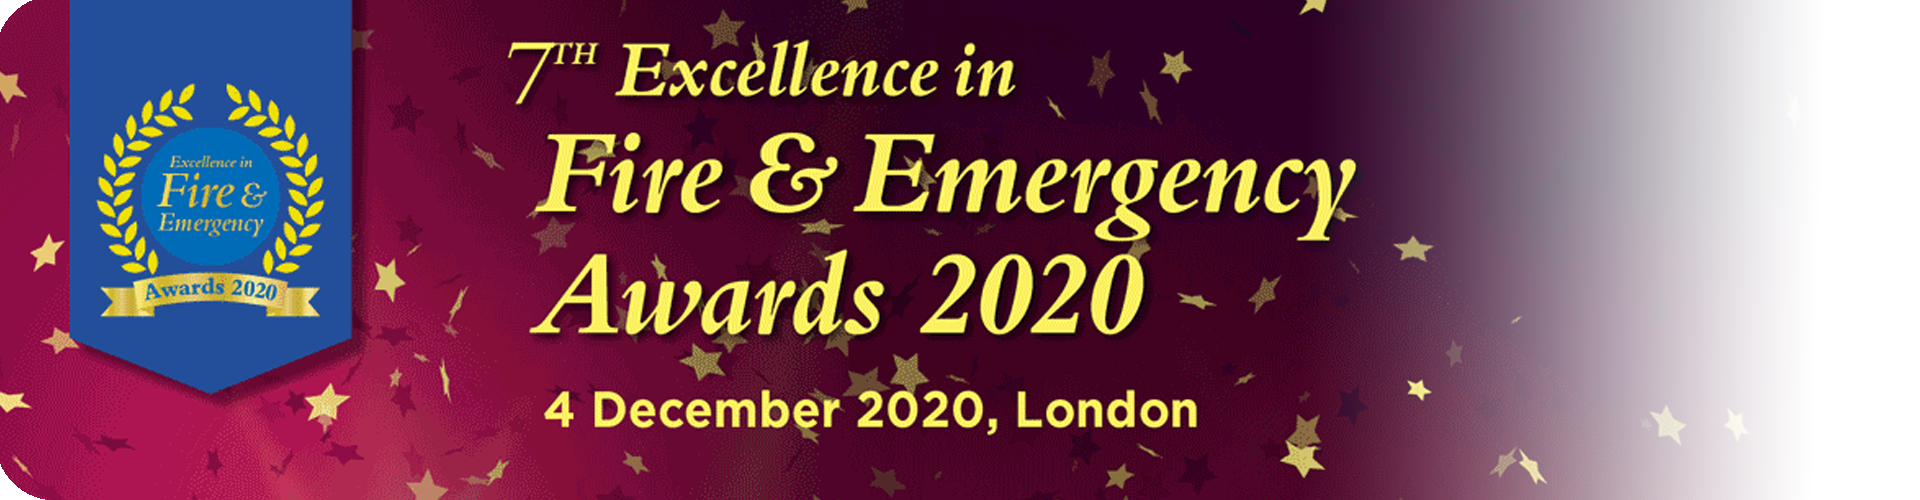 fire & emergency awards 2020 banner